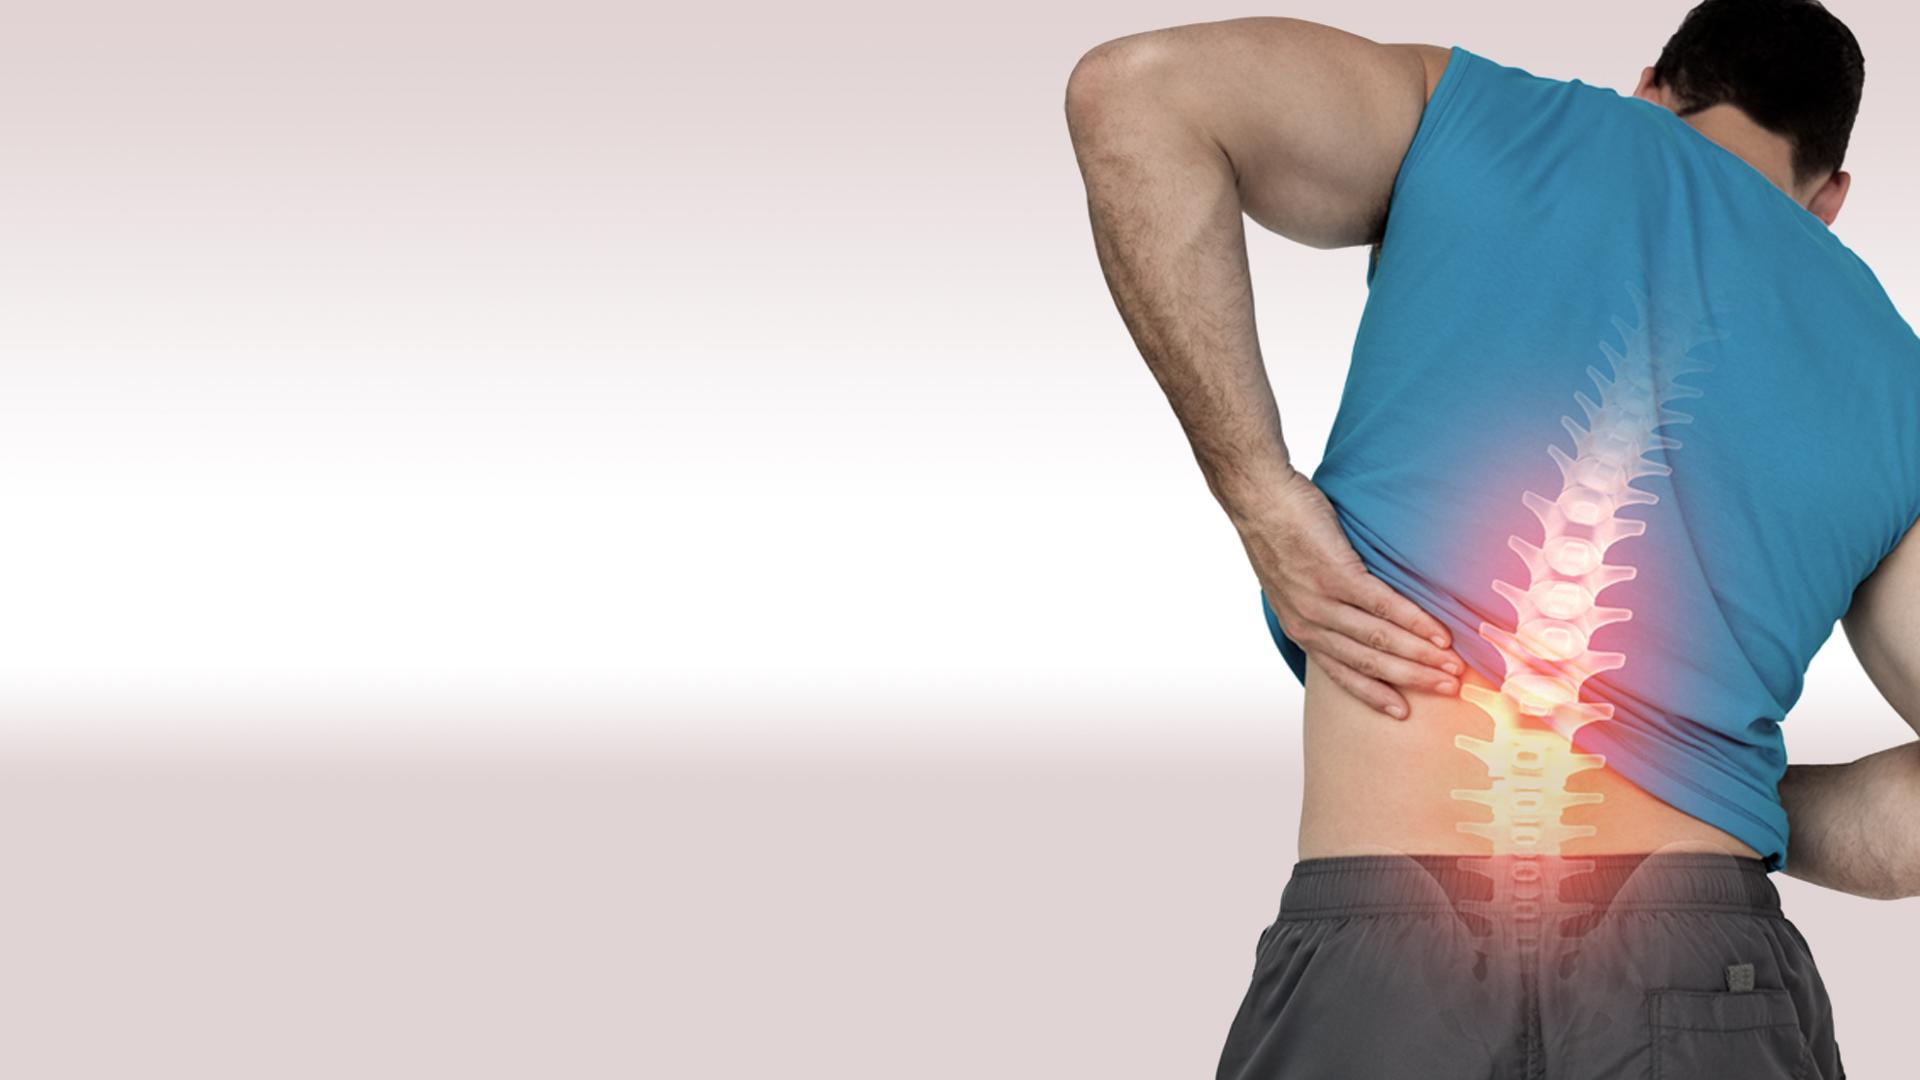 Treating Lower Back Pain Through Kettlebell Training